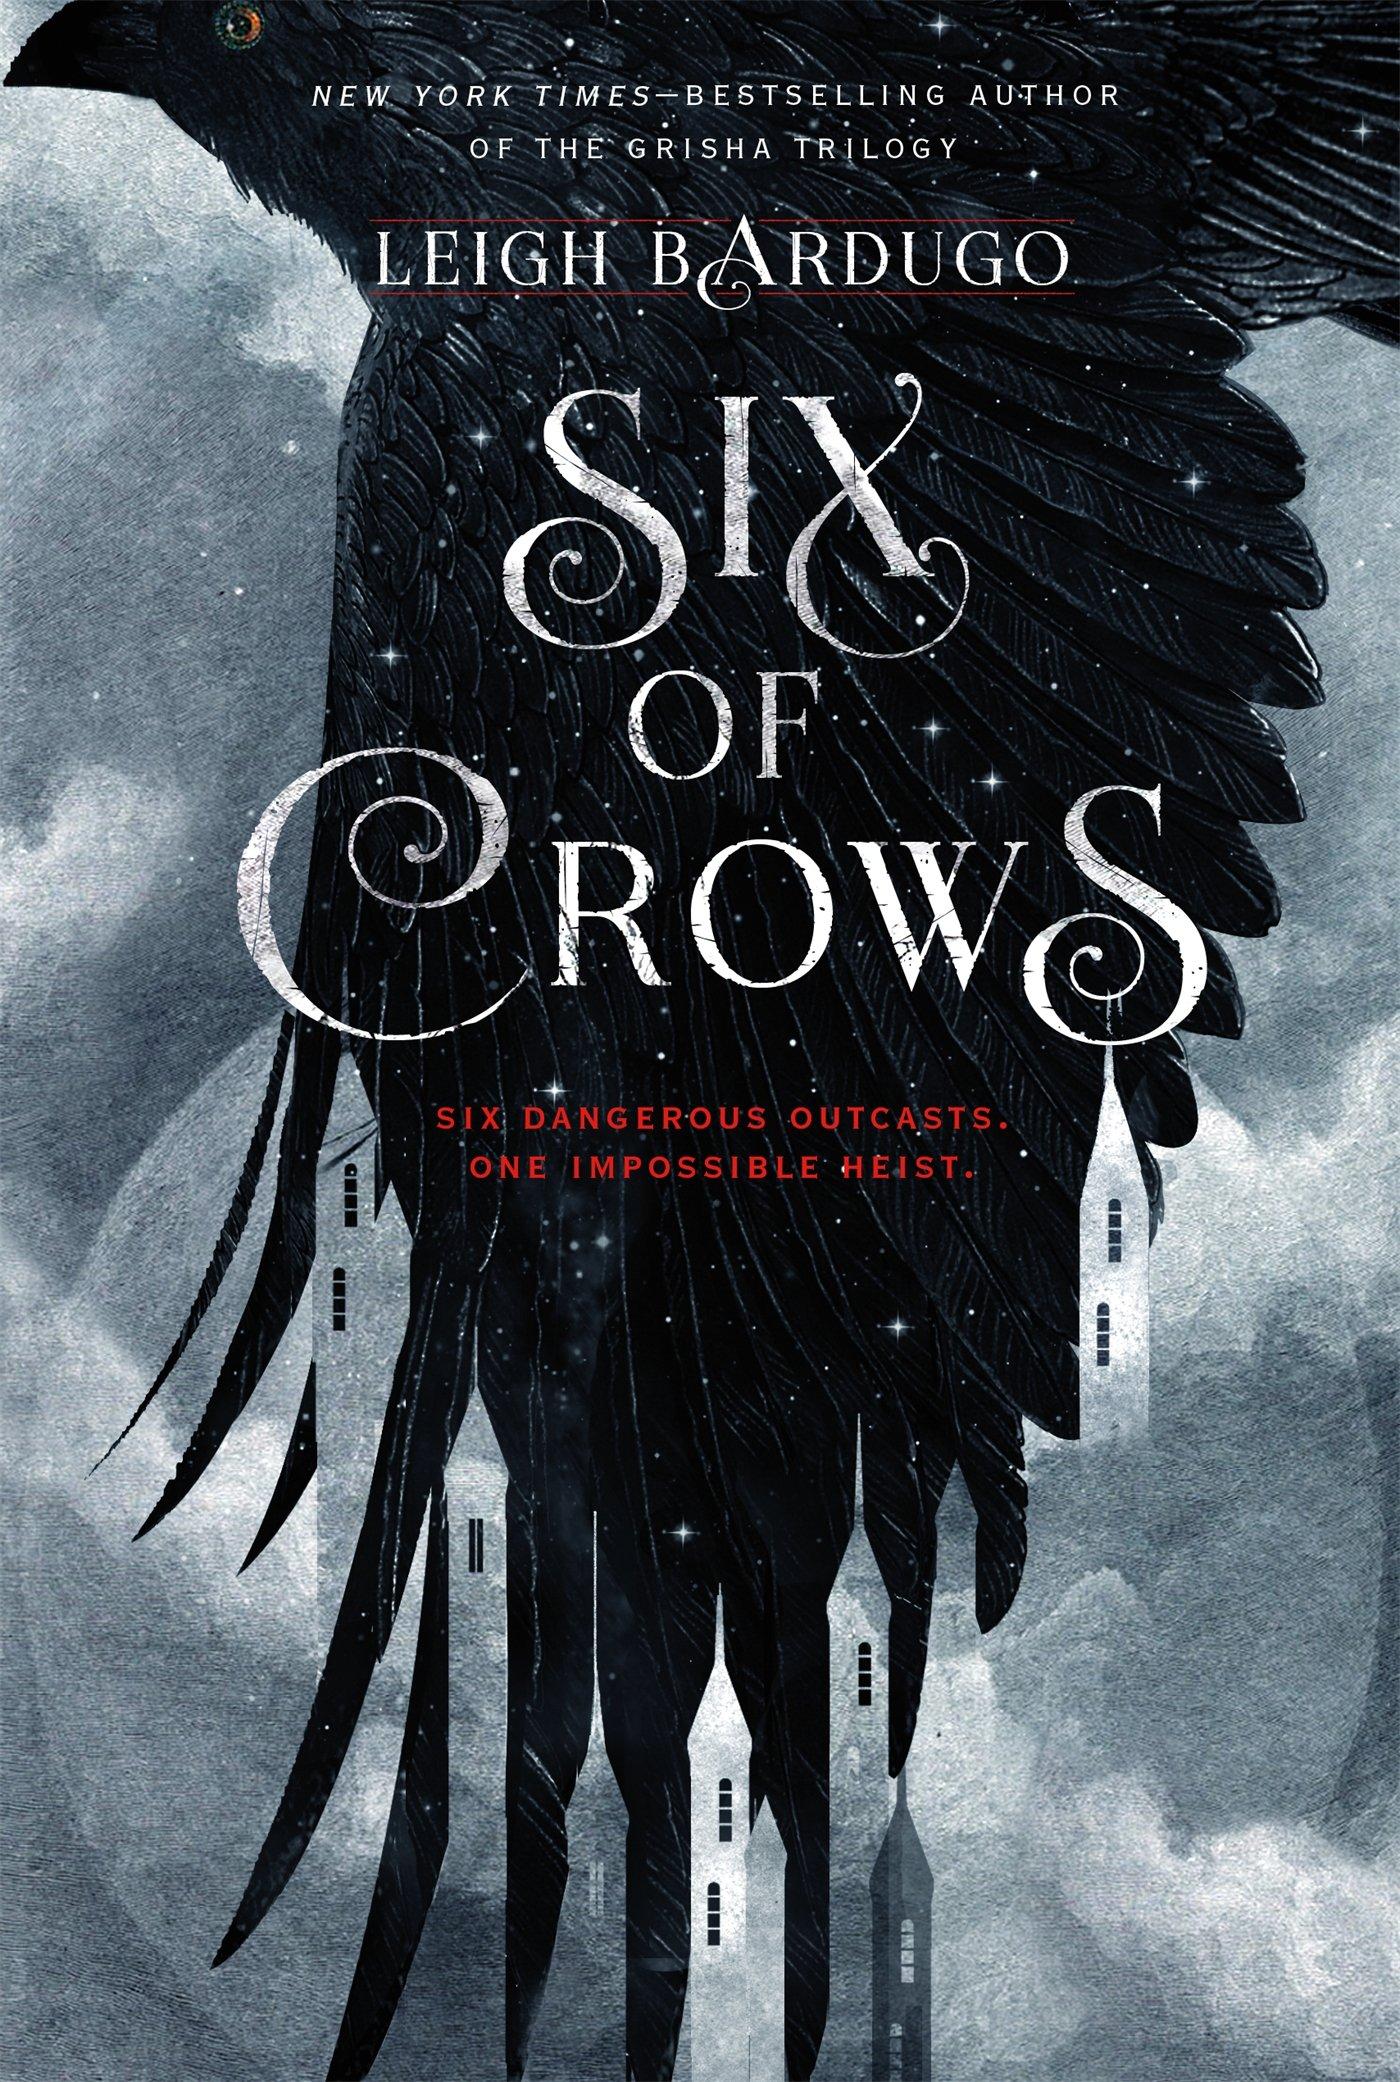 six of crows-leigh bardugo-the grisha trilogy-blossom books